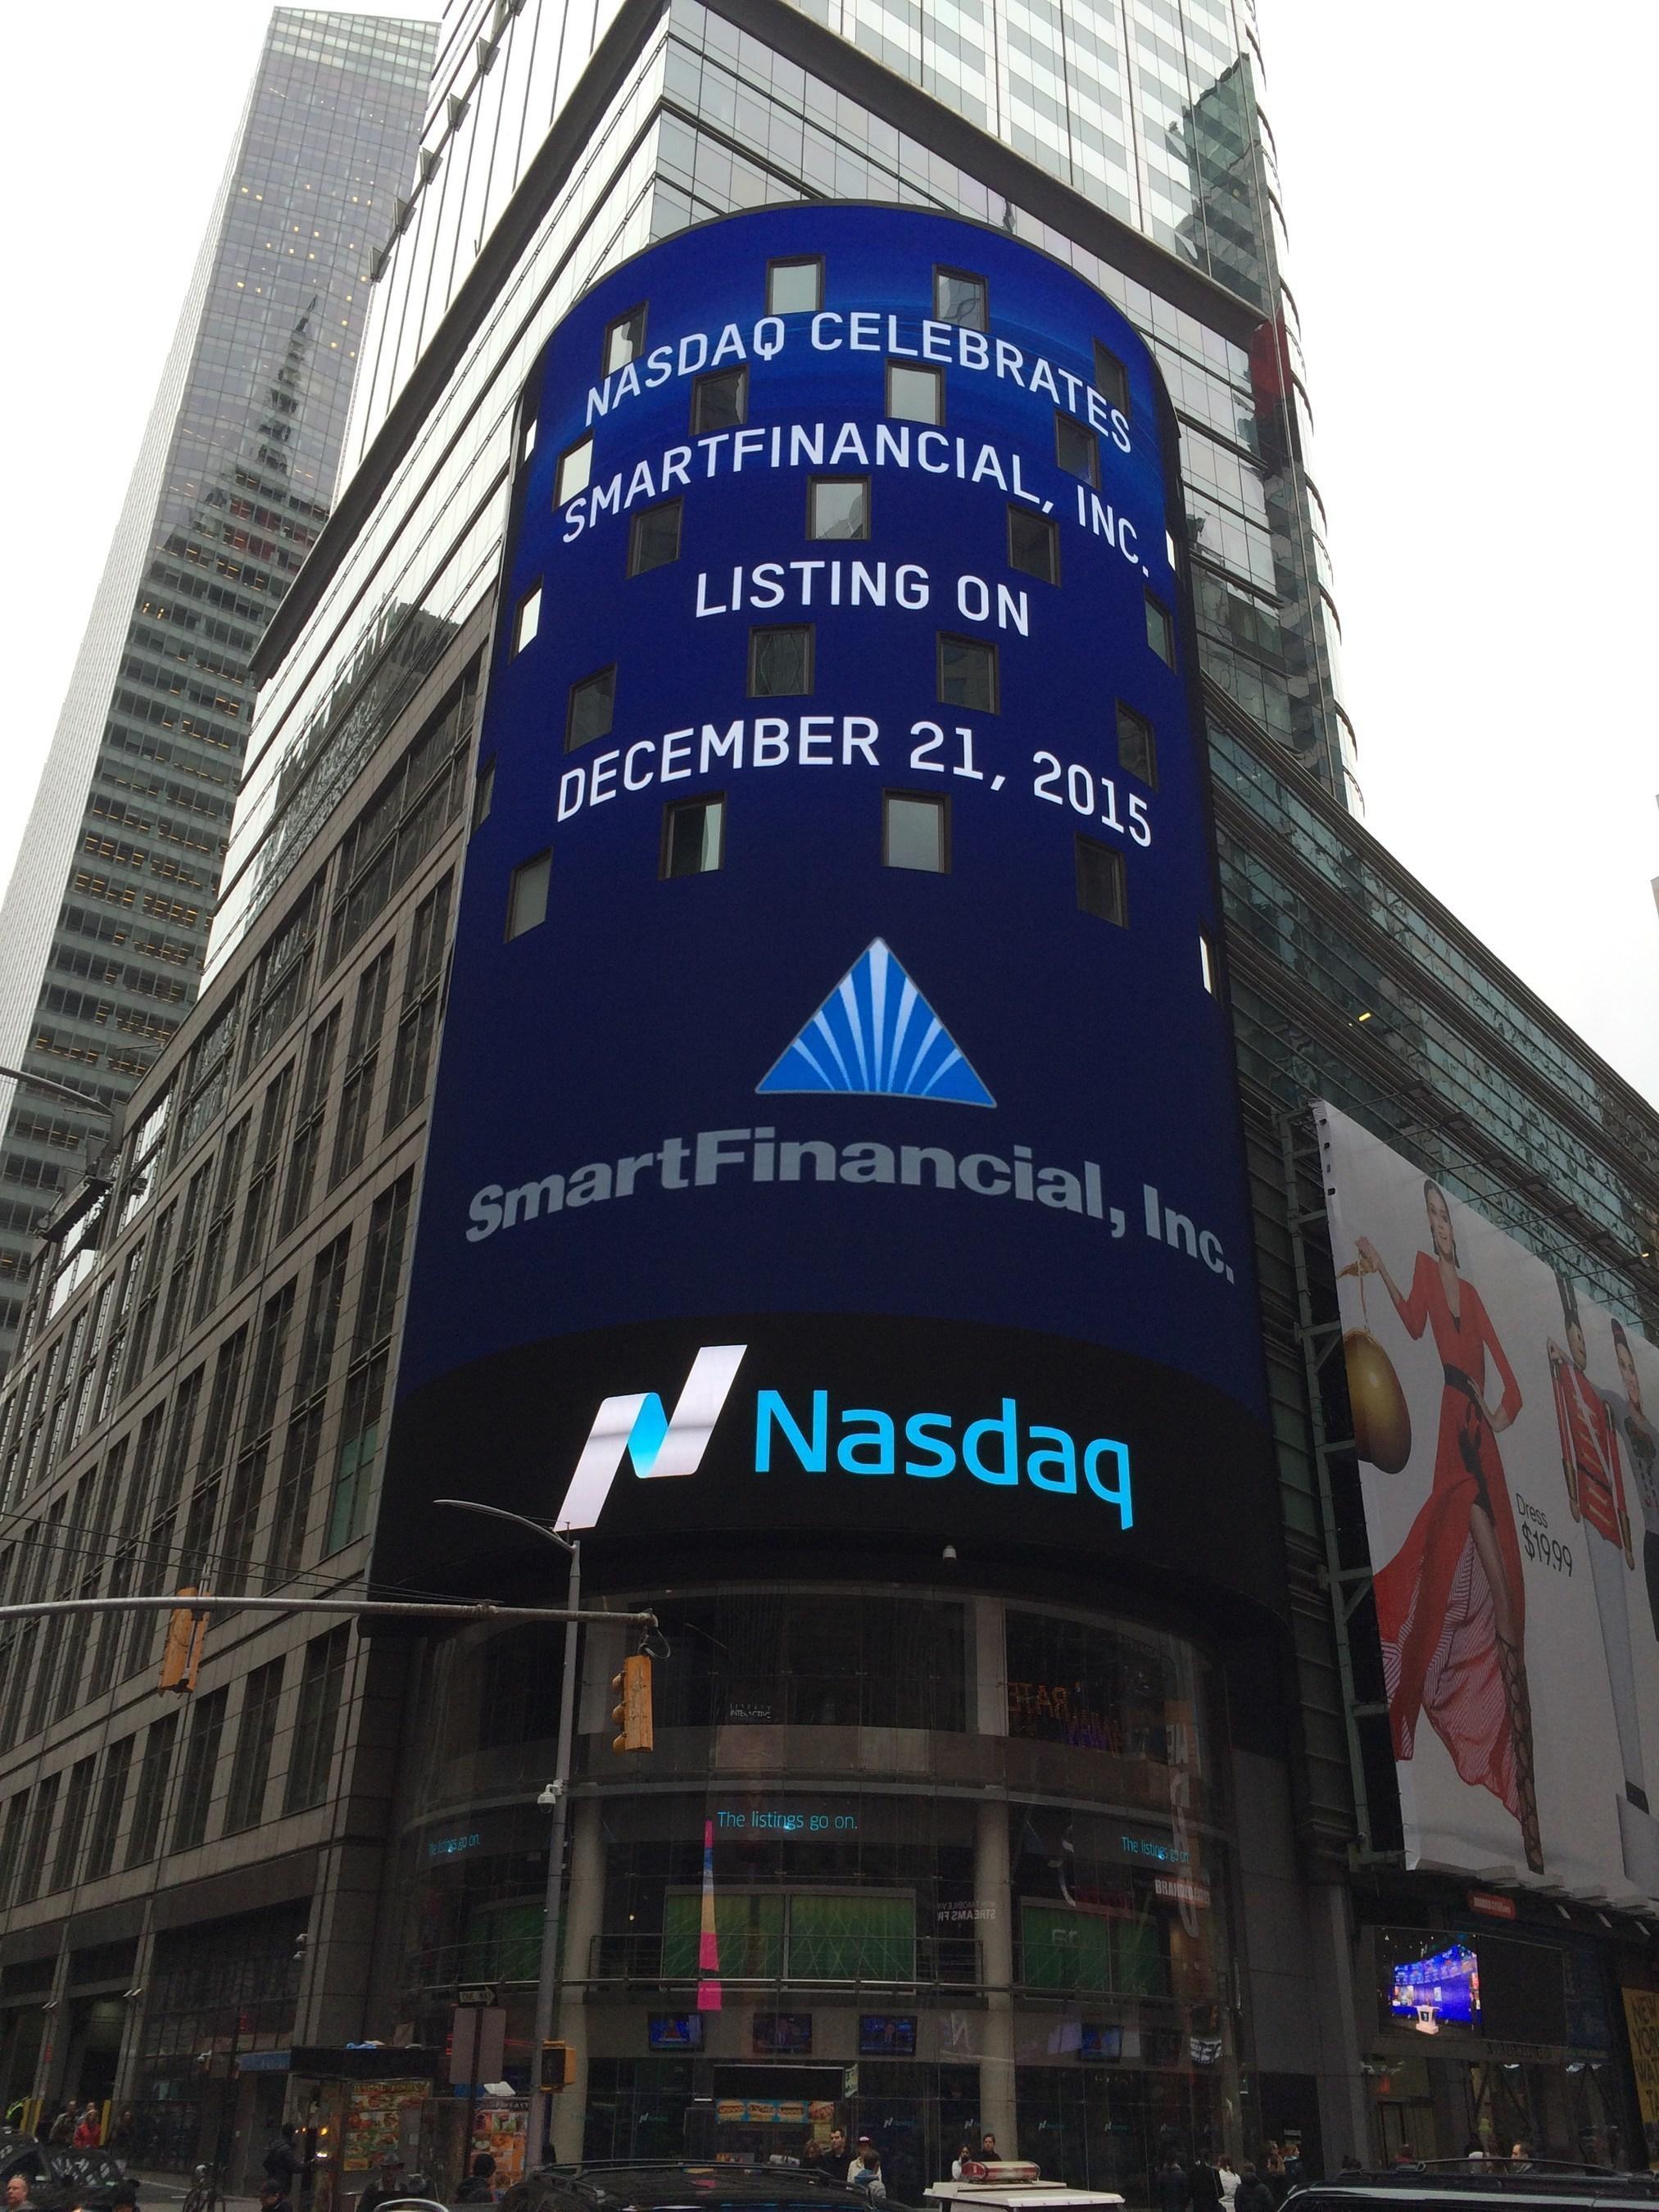 SmartFinancial, Inc. Joins Nasdaq Capital Market